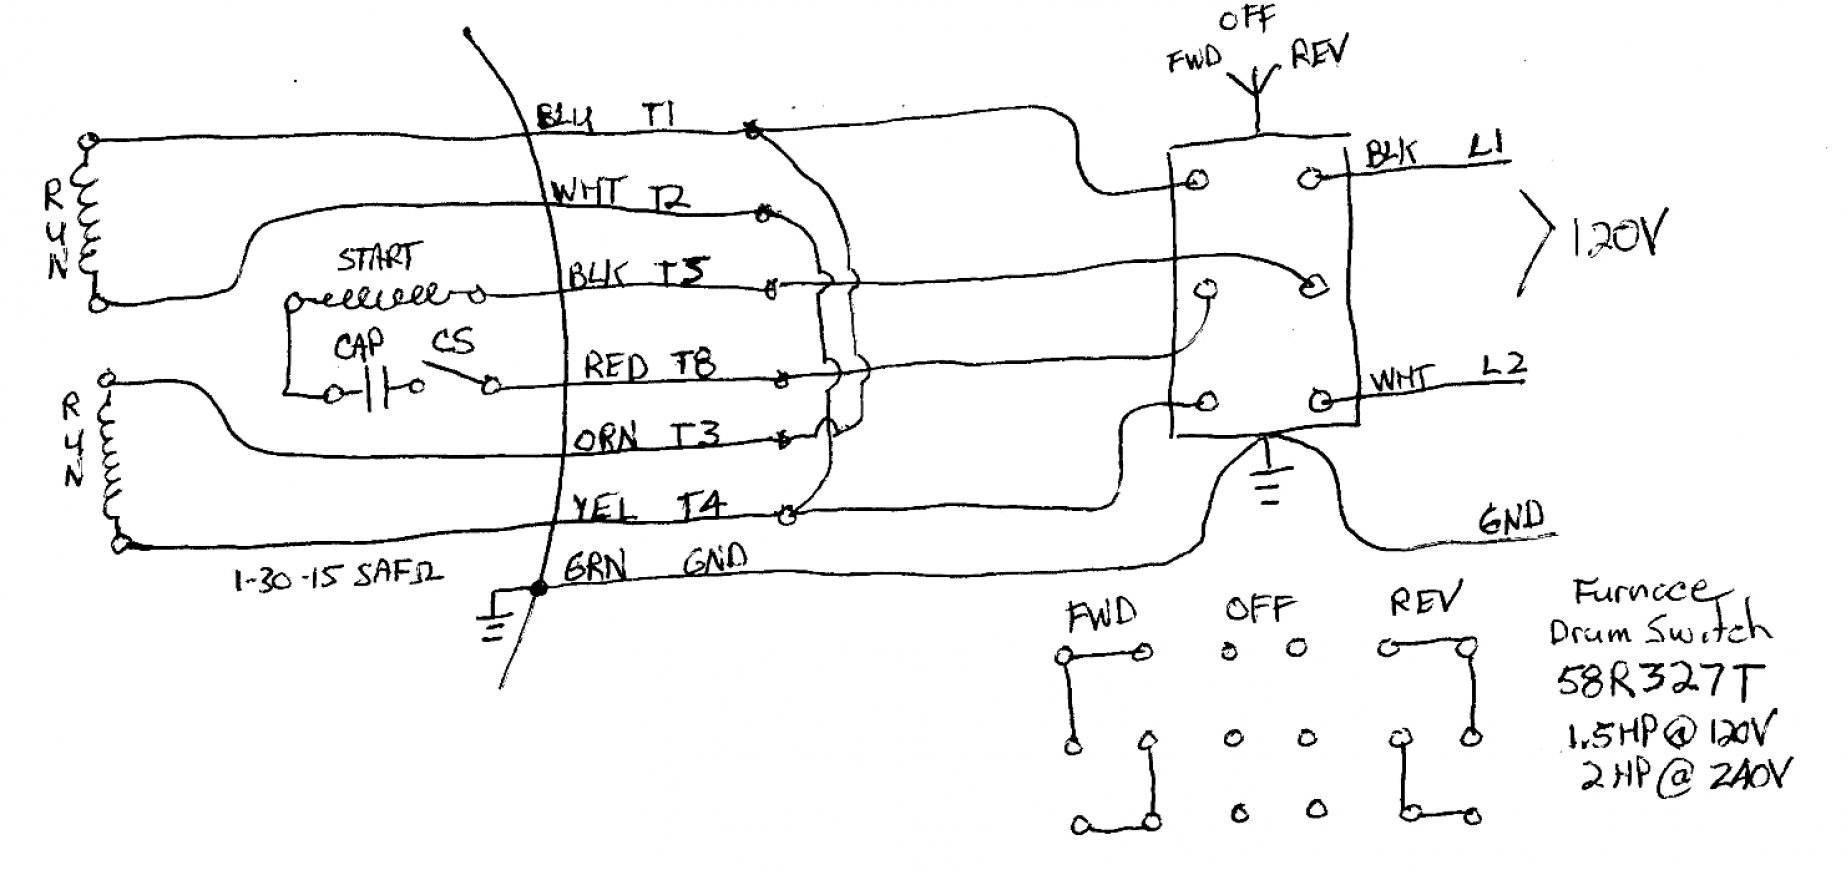 hight resolution of leeson motor drum switch wiring diagram for a 1 9 ulrich temme de u2022leeson motor